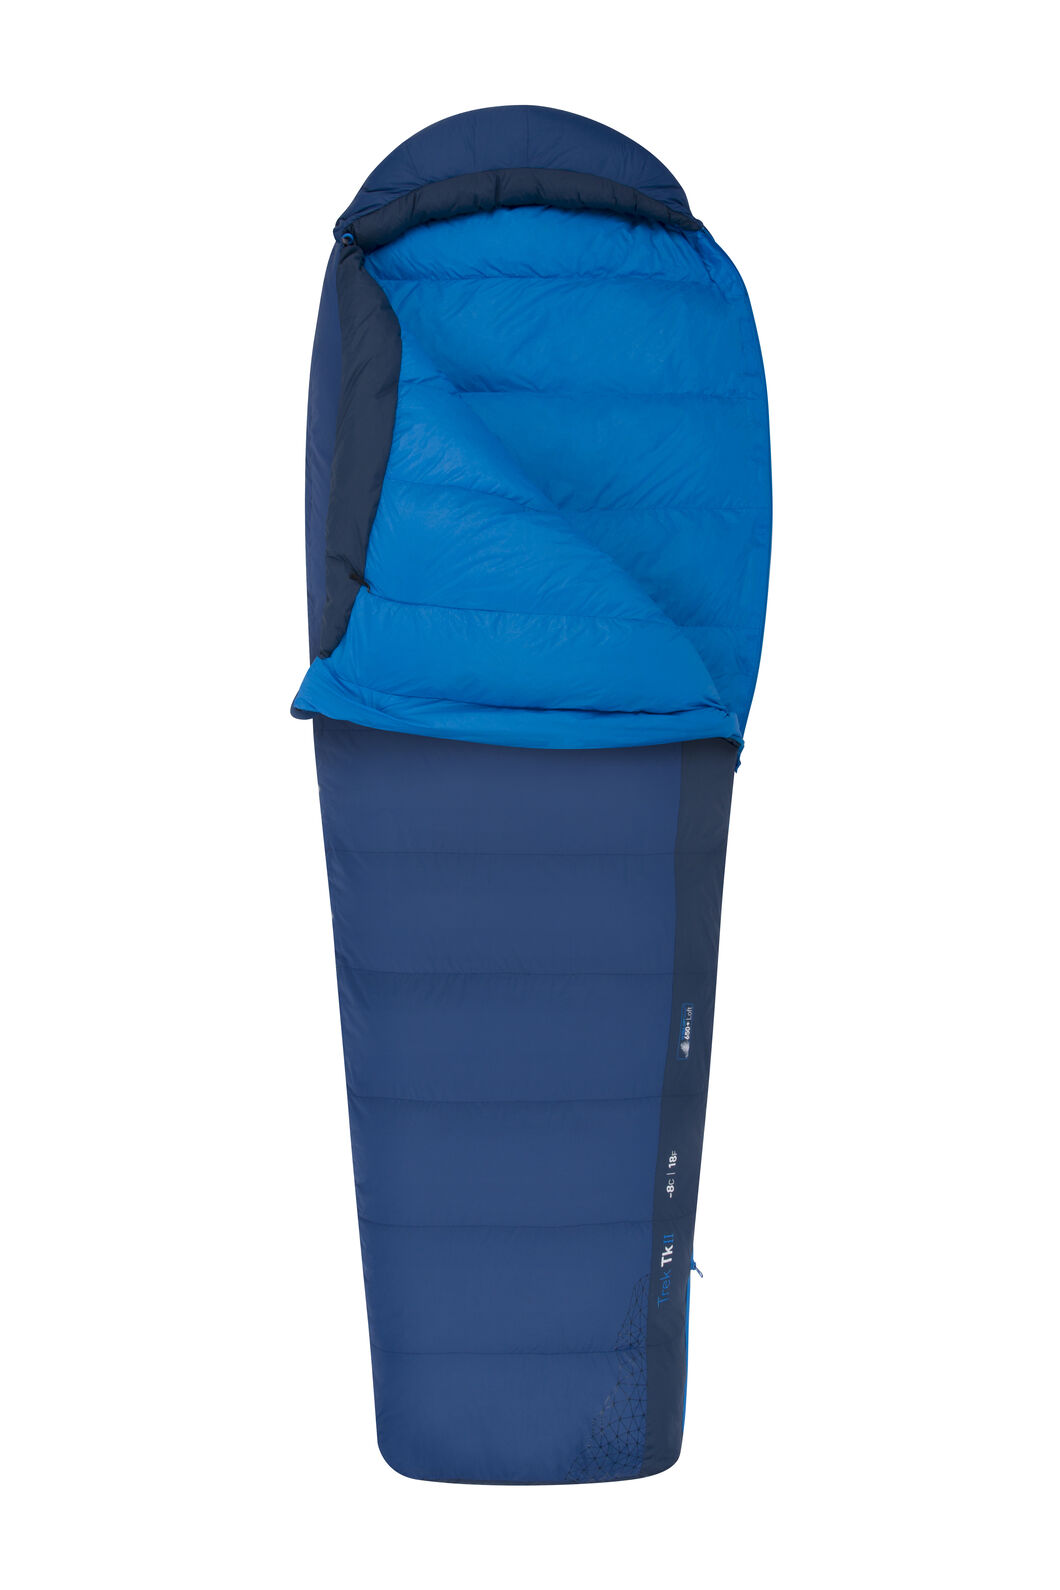 Sea to Summit Trek TKII Sleeping Bag - Regular, Blue, hi-res